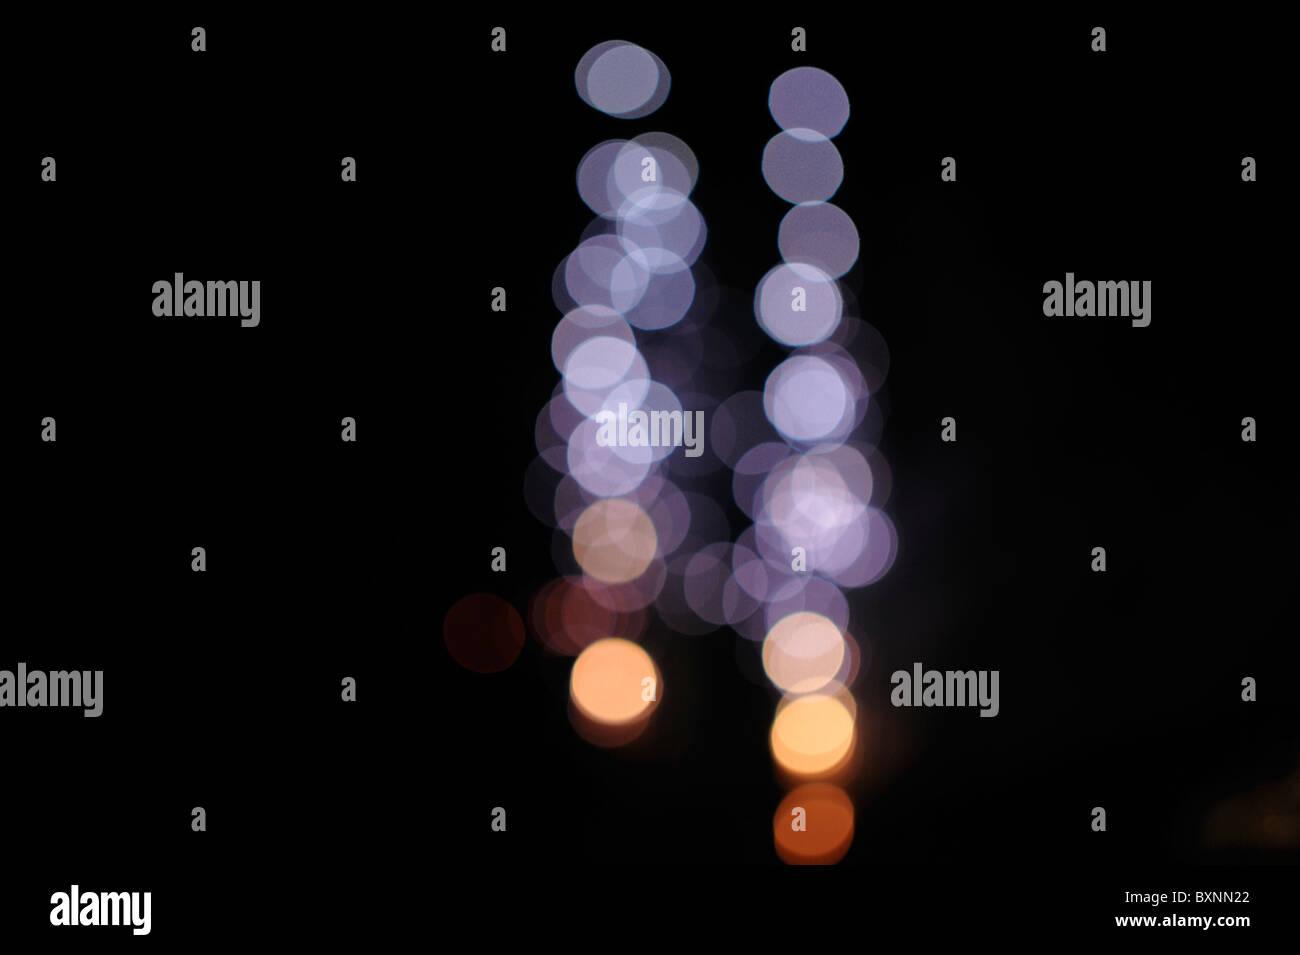 Resumen patrones de luces. Foto de stock